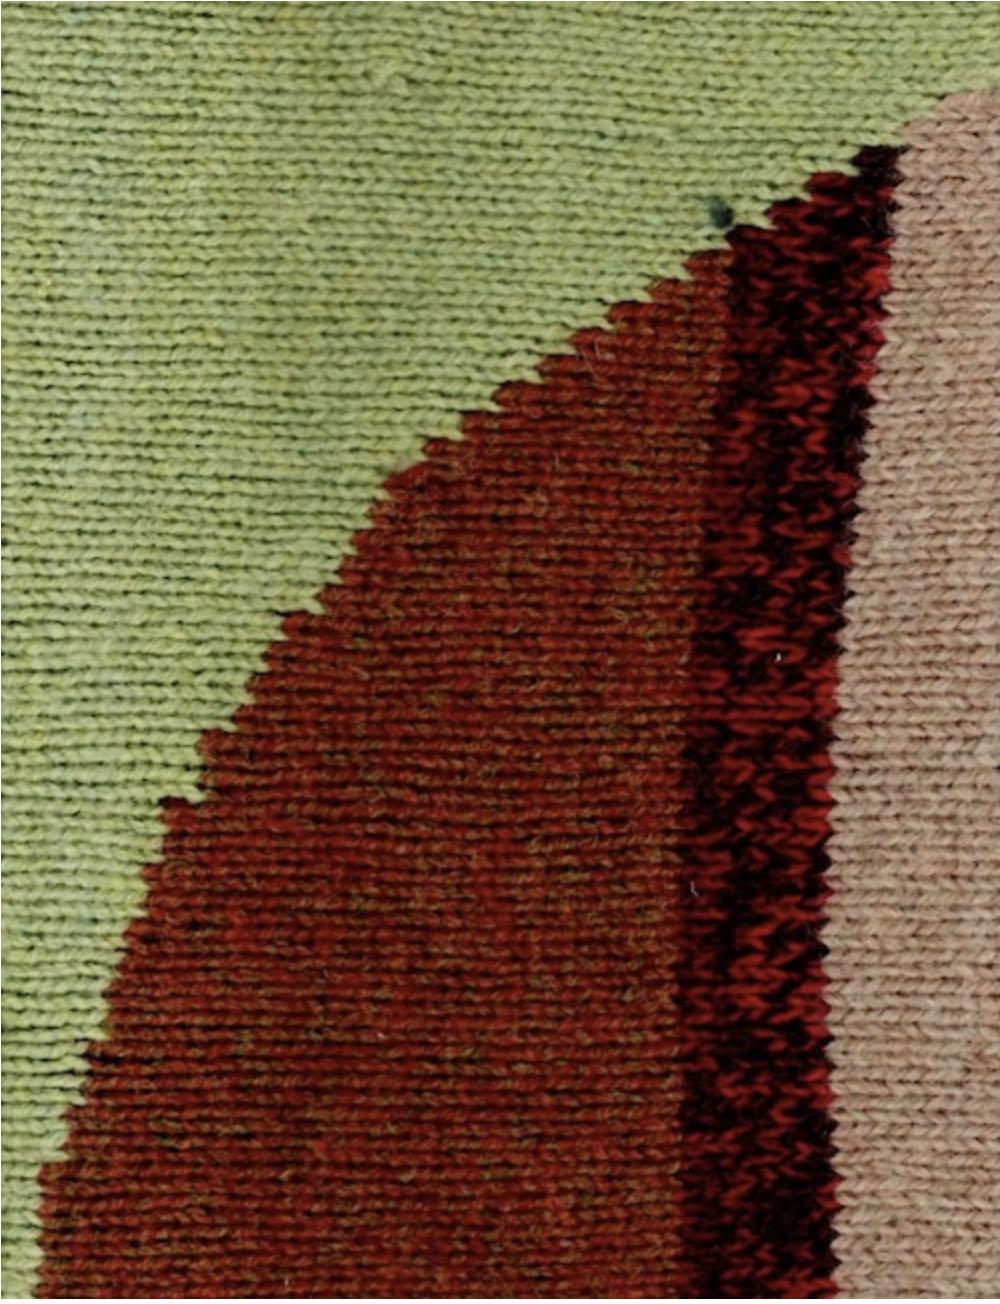 sweater33.jpg